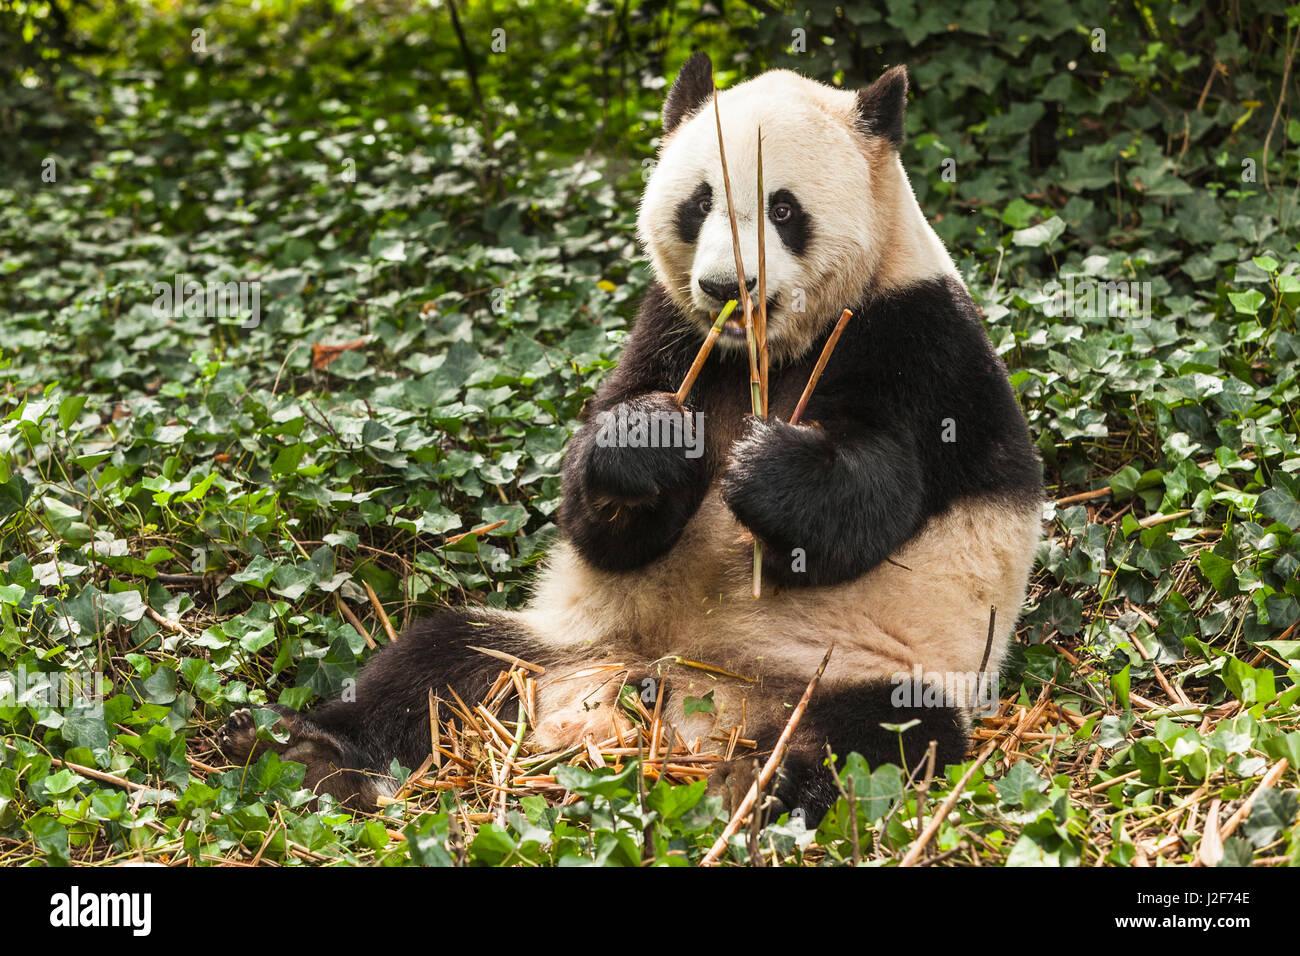 Giant Panda eating bamboo - Stock Image